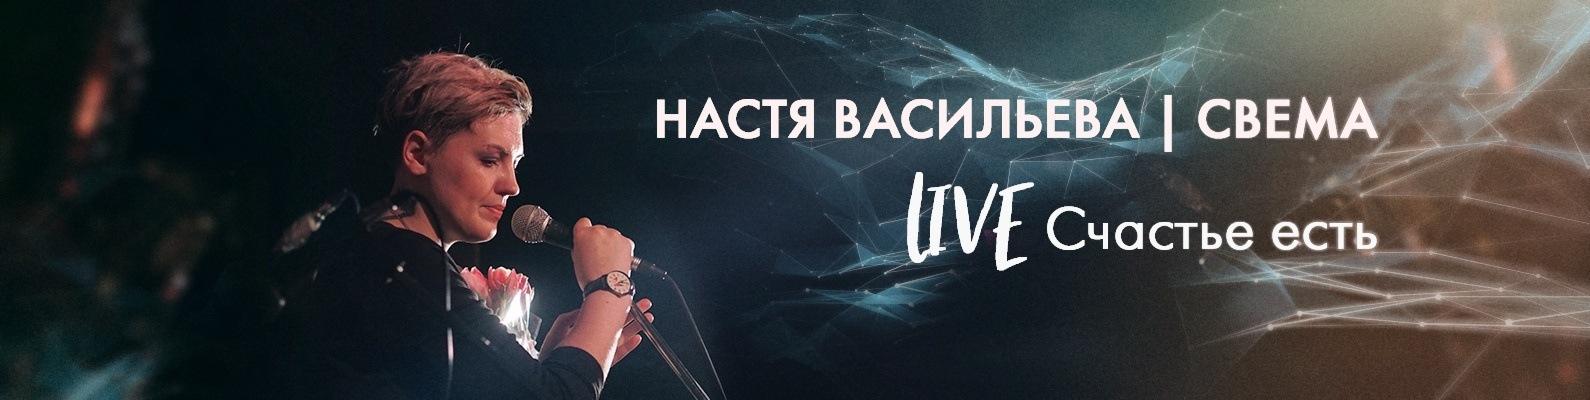 Счастье есть by настя васильева on amazon music amazon. Com.